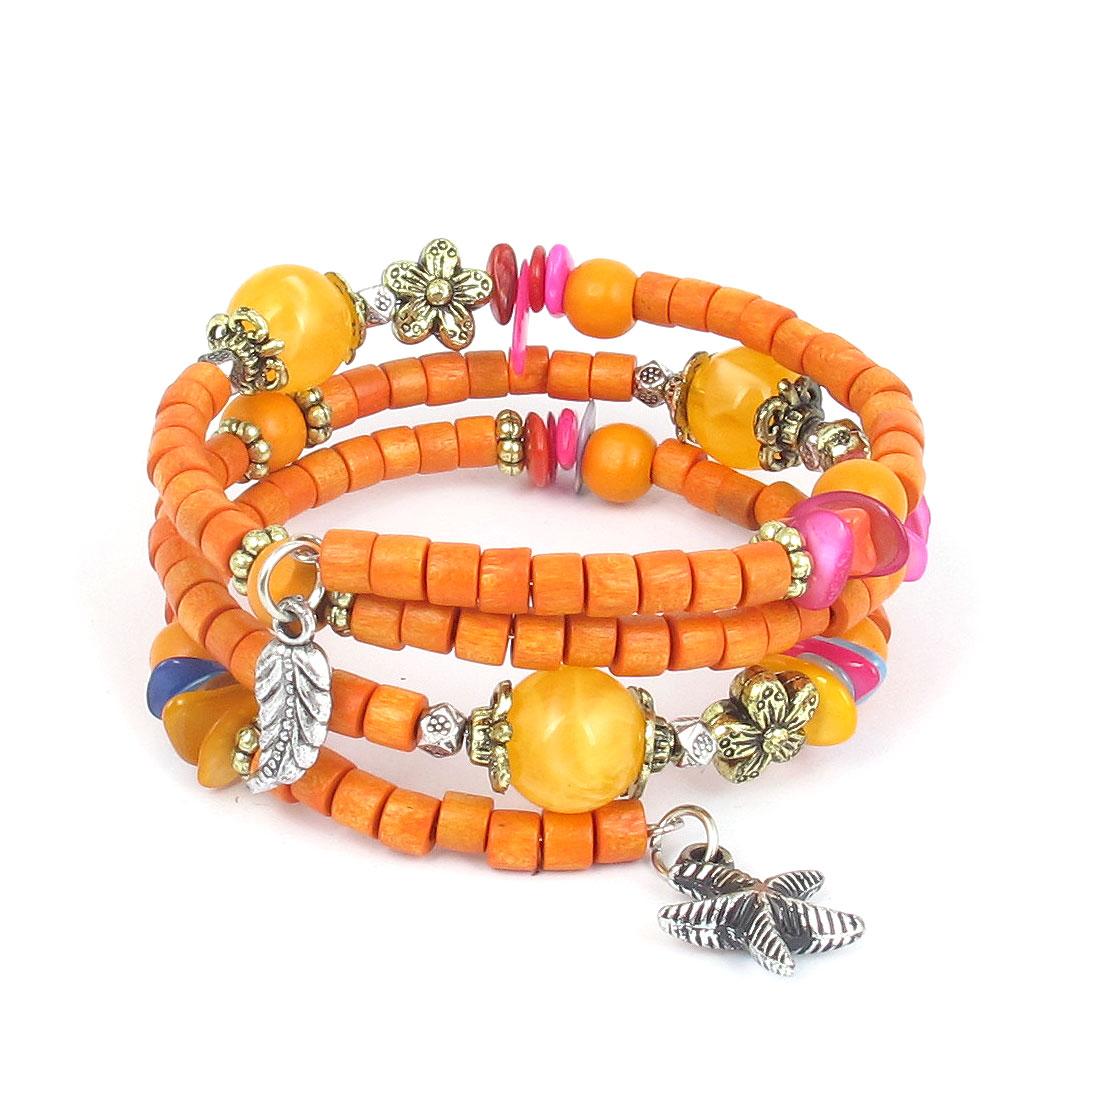 Women Handmade National Style Wooden Cylinder Beads Flower Decor 3-layer Bangle Bracelet Orange